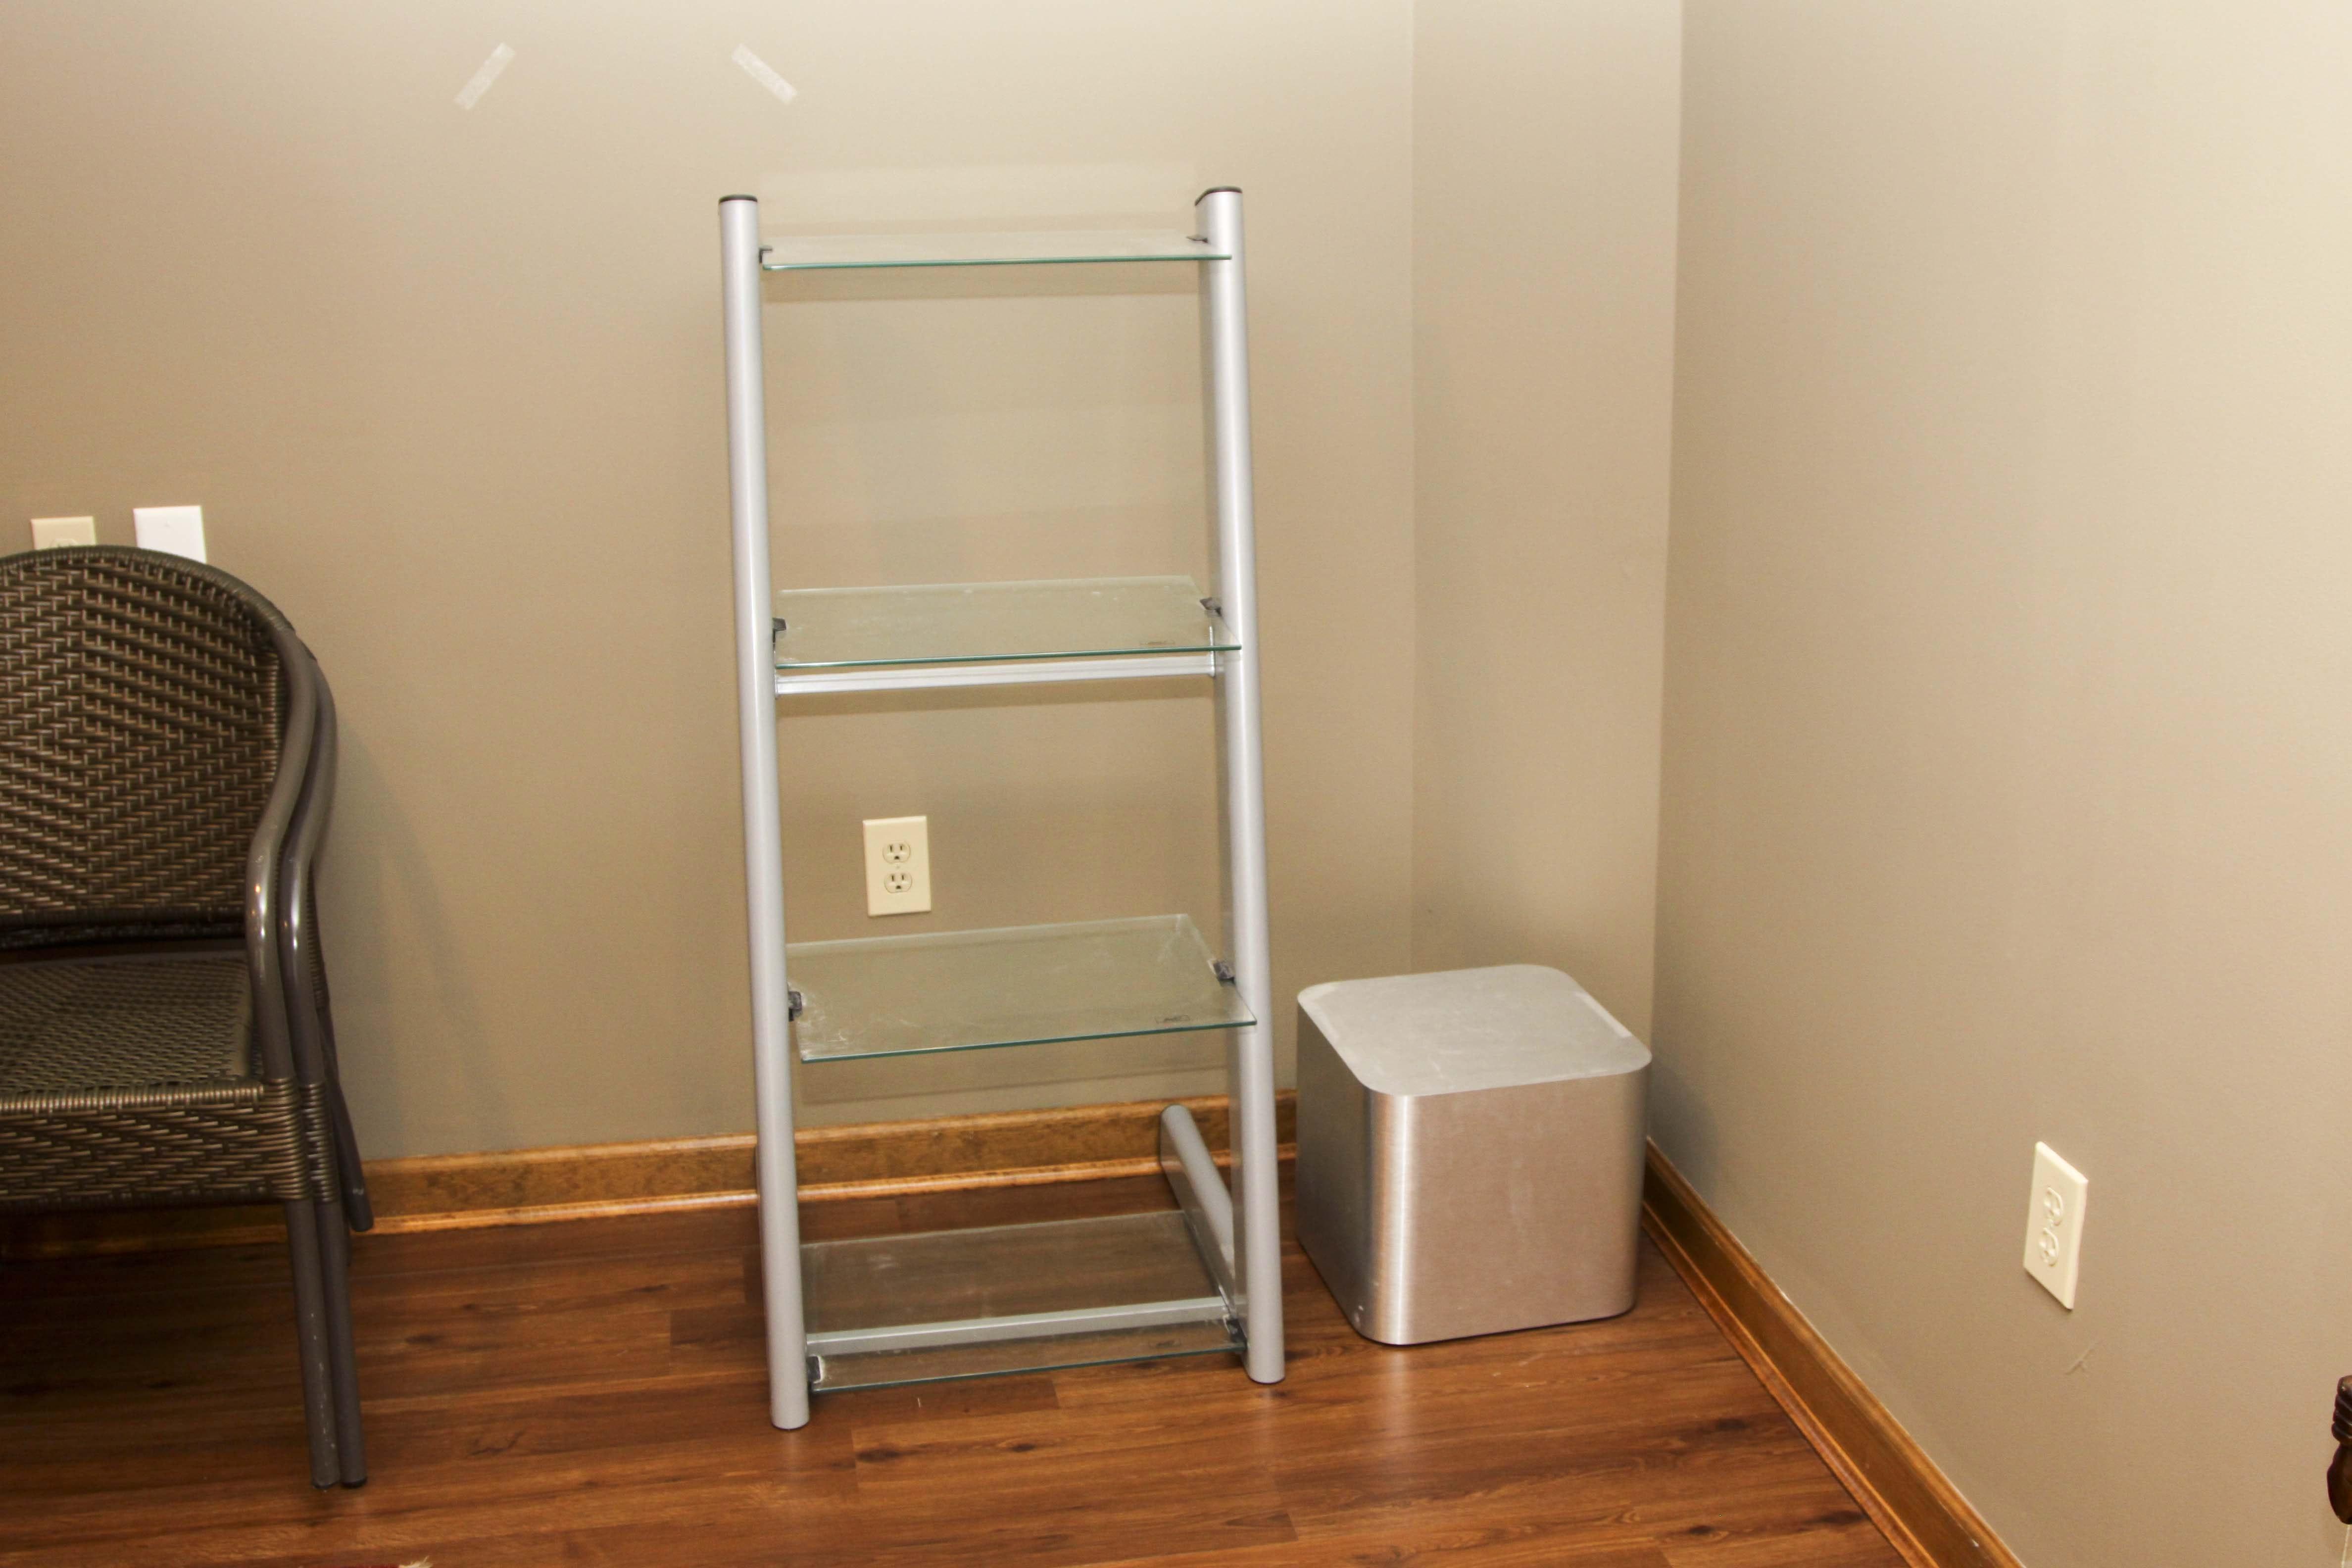 Contemporary Glass Shelf and Stand